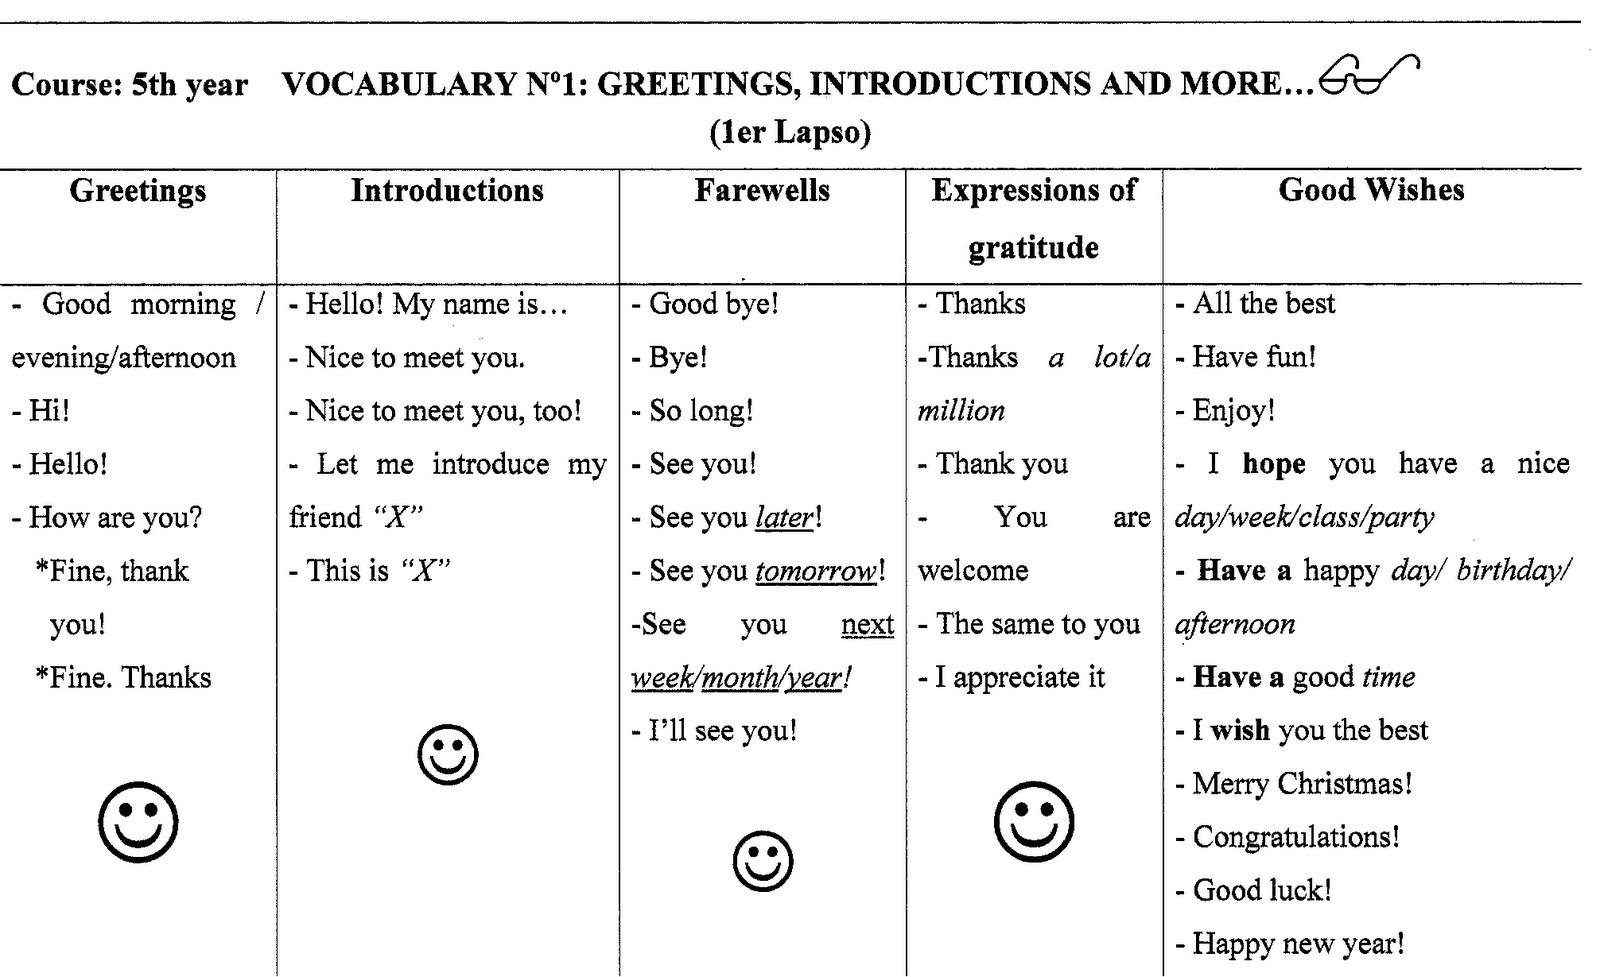 Pronunciation en ingles americano online dating 9